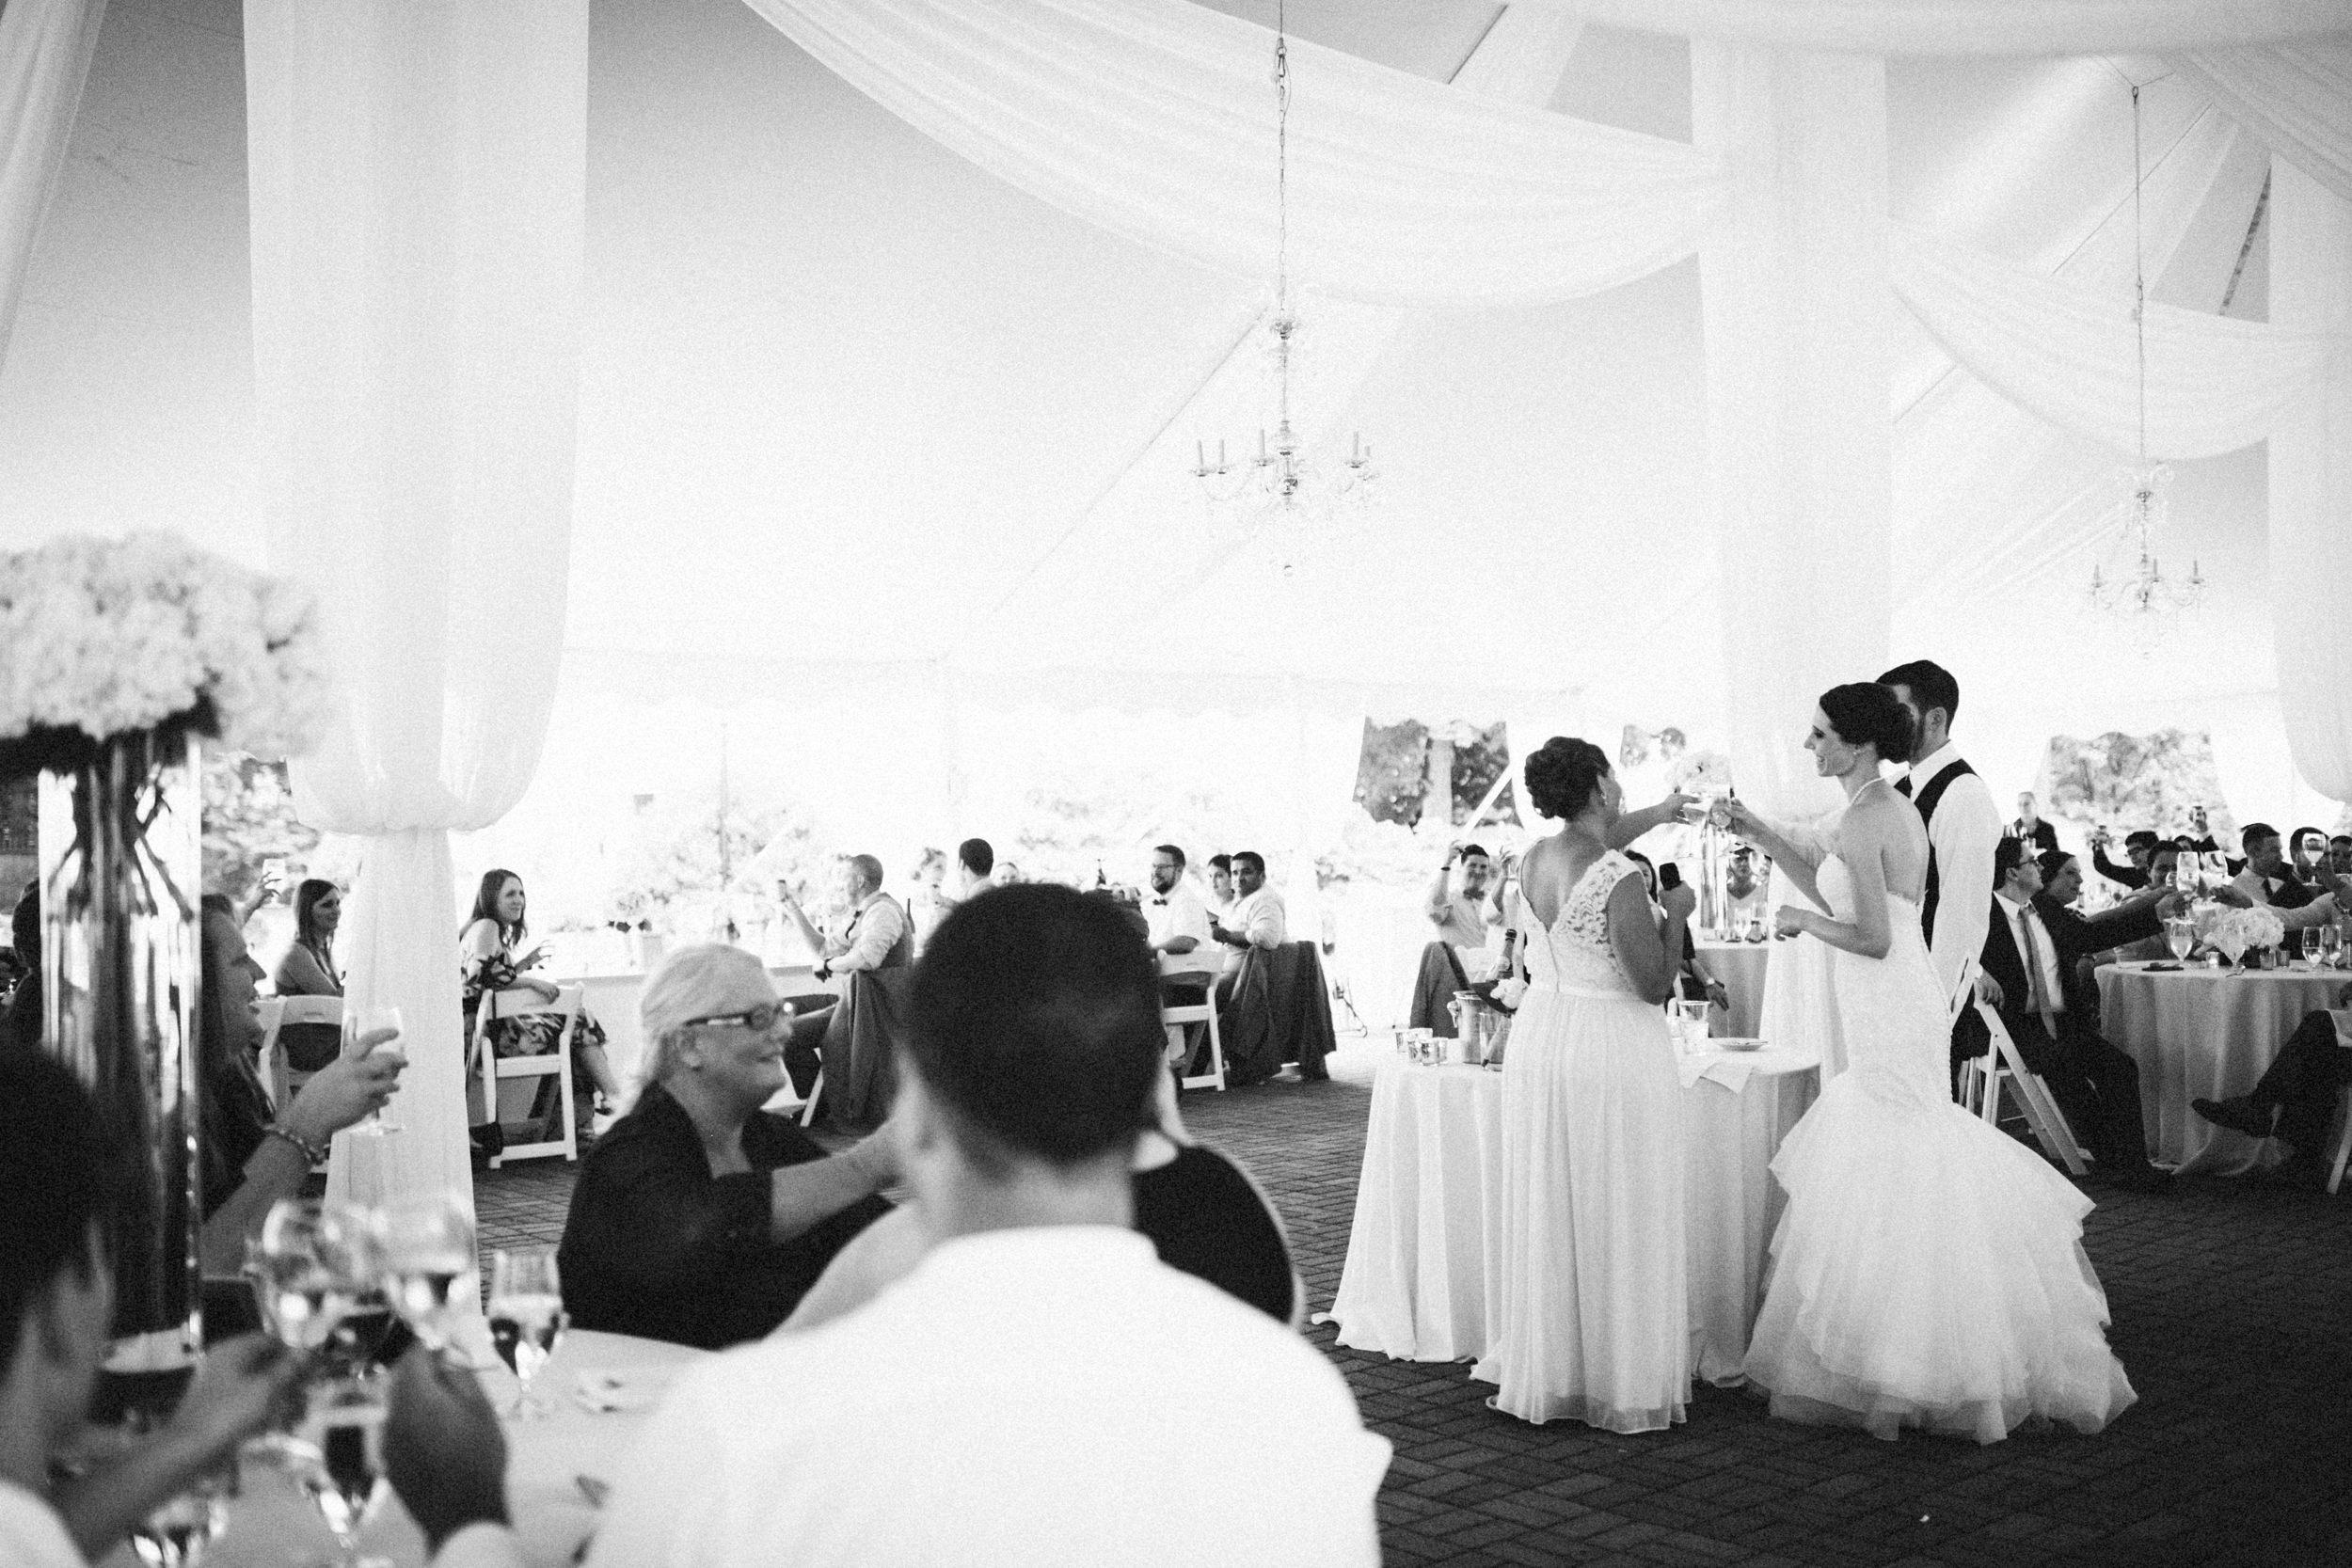 Louisville-Kentucky-Wedding-Elopement-Photographer-Sarah-Katherine-Davis-Photography-Whitehall-Classic-Timeless-Garden-Wedding-636.jpg